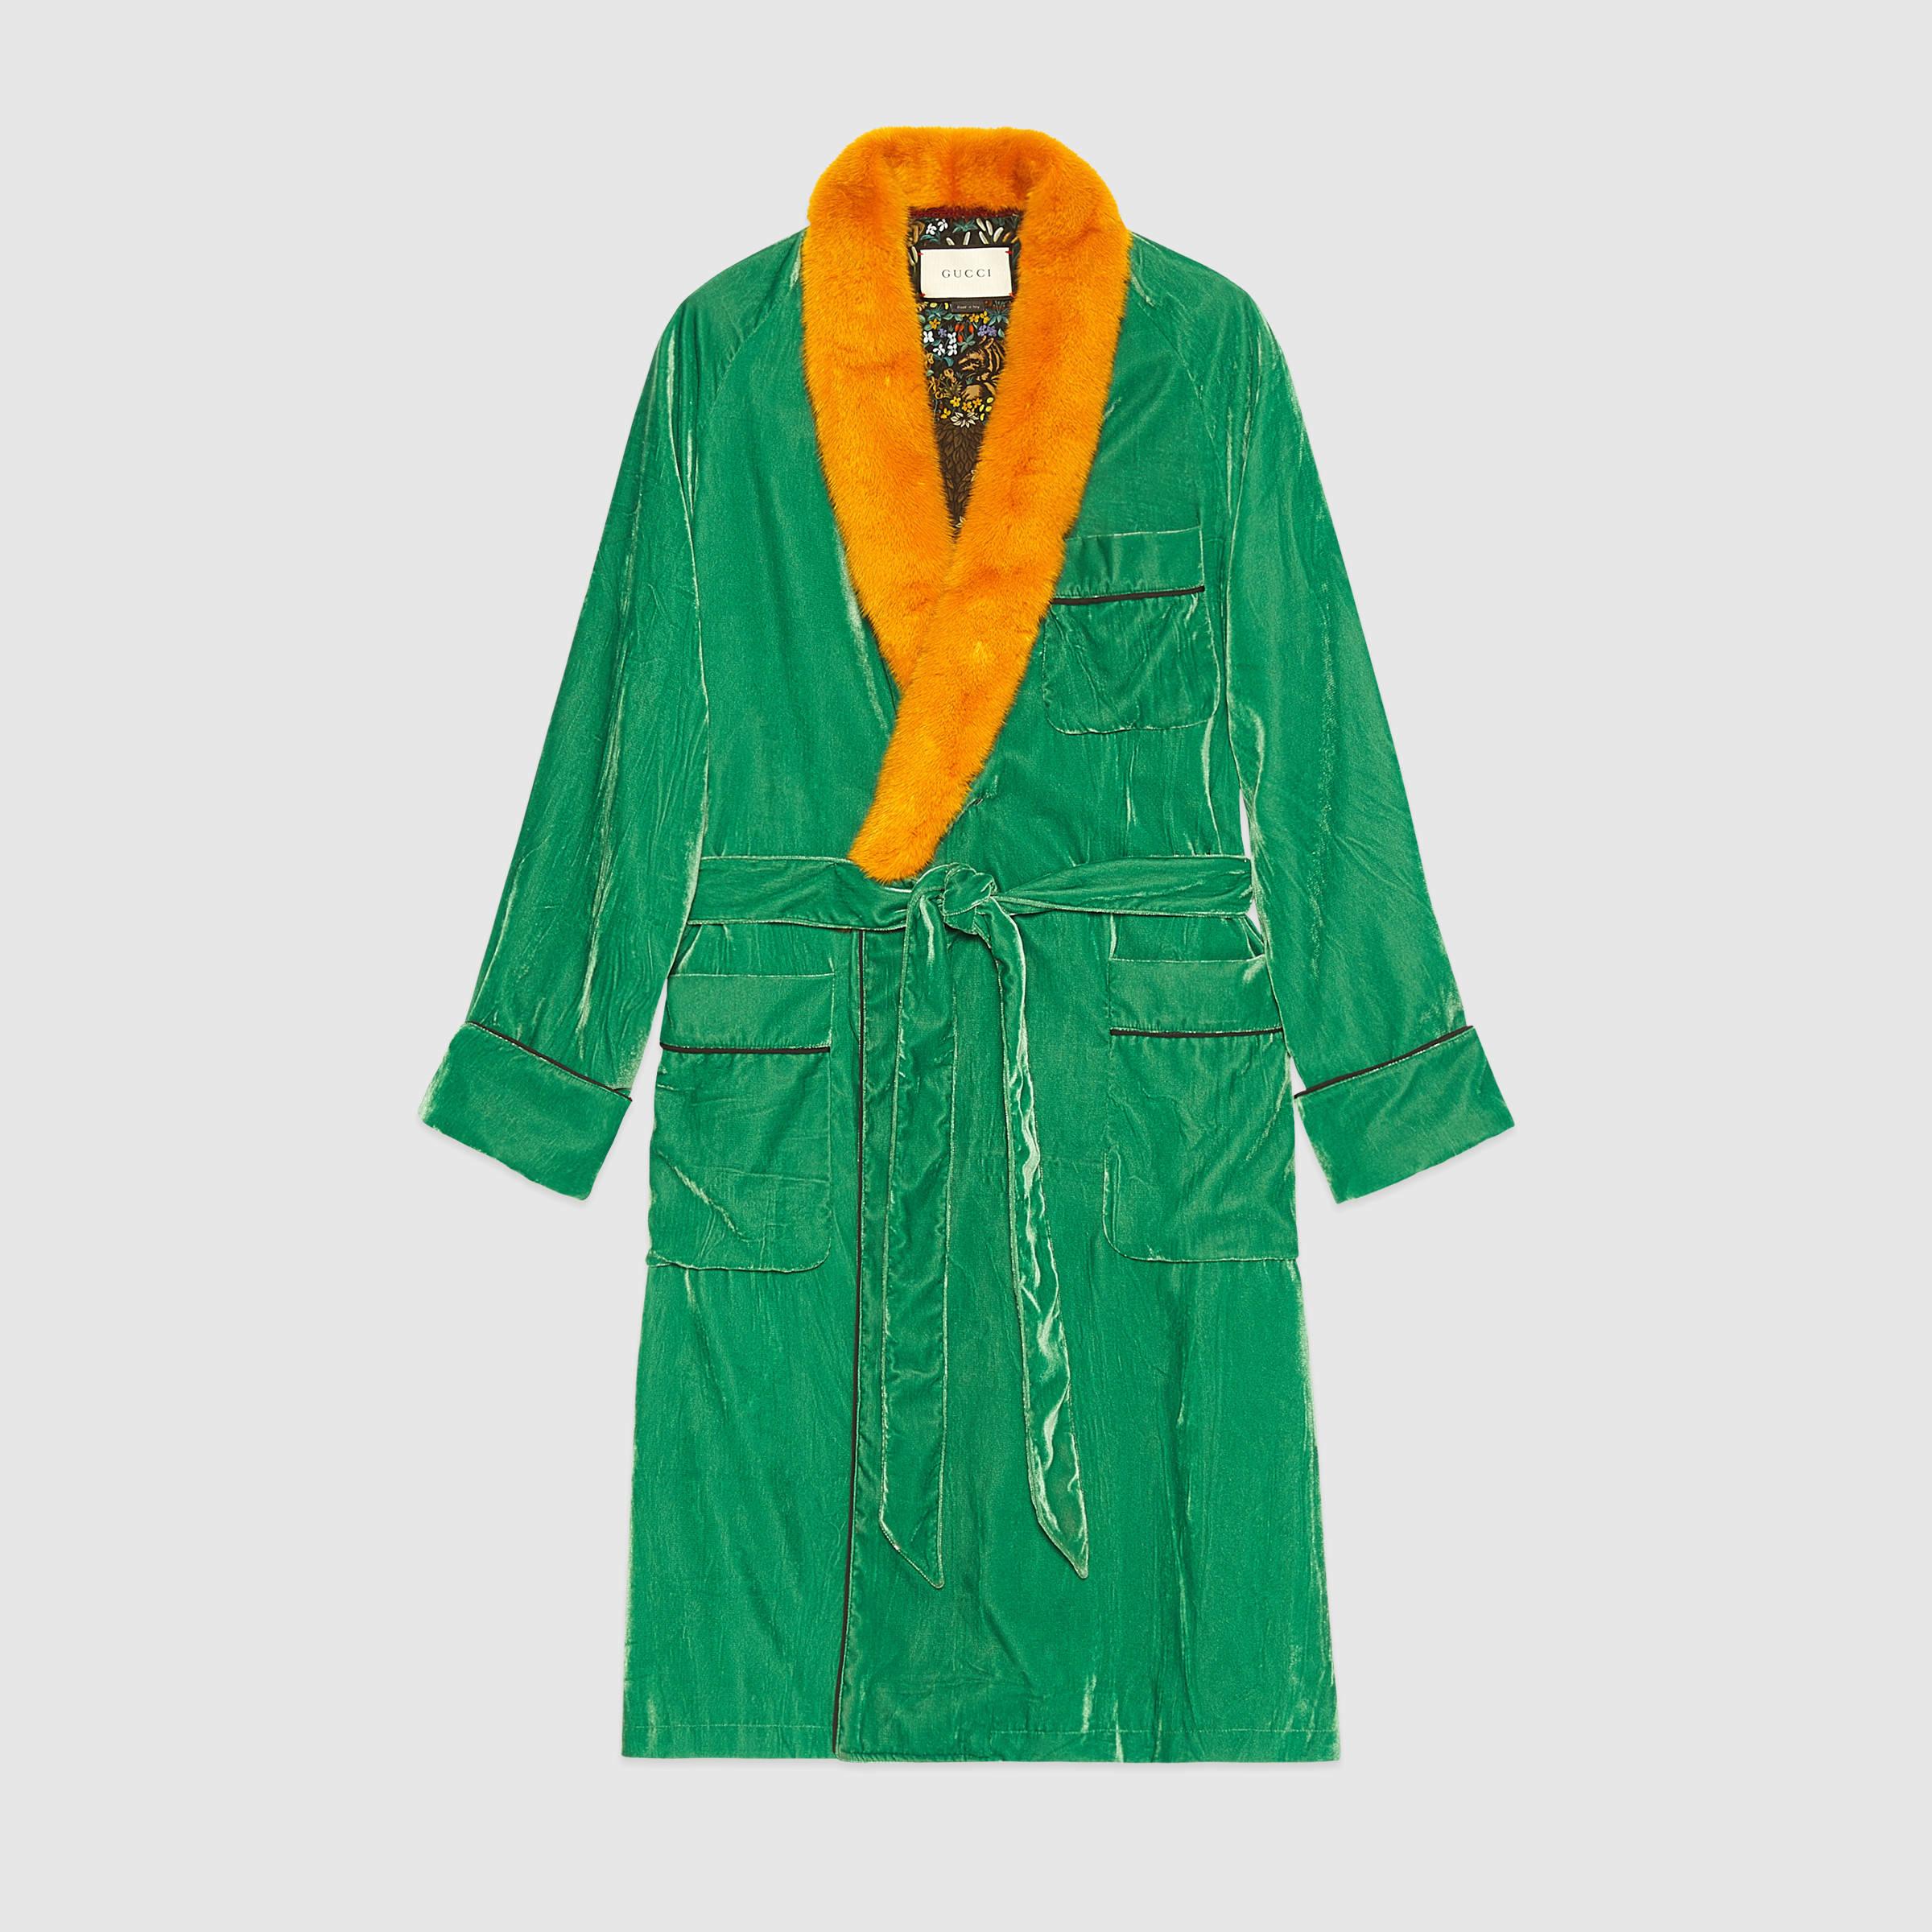 Lyst Gucci Embroidered Velvet Dressing Gown For Men